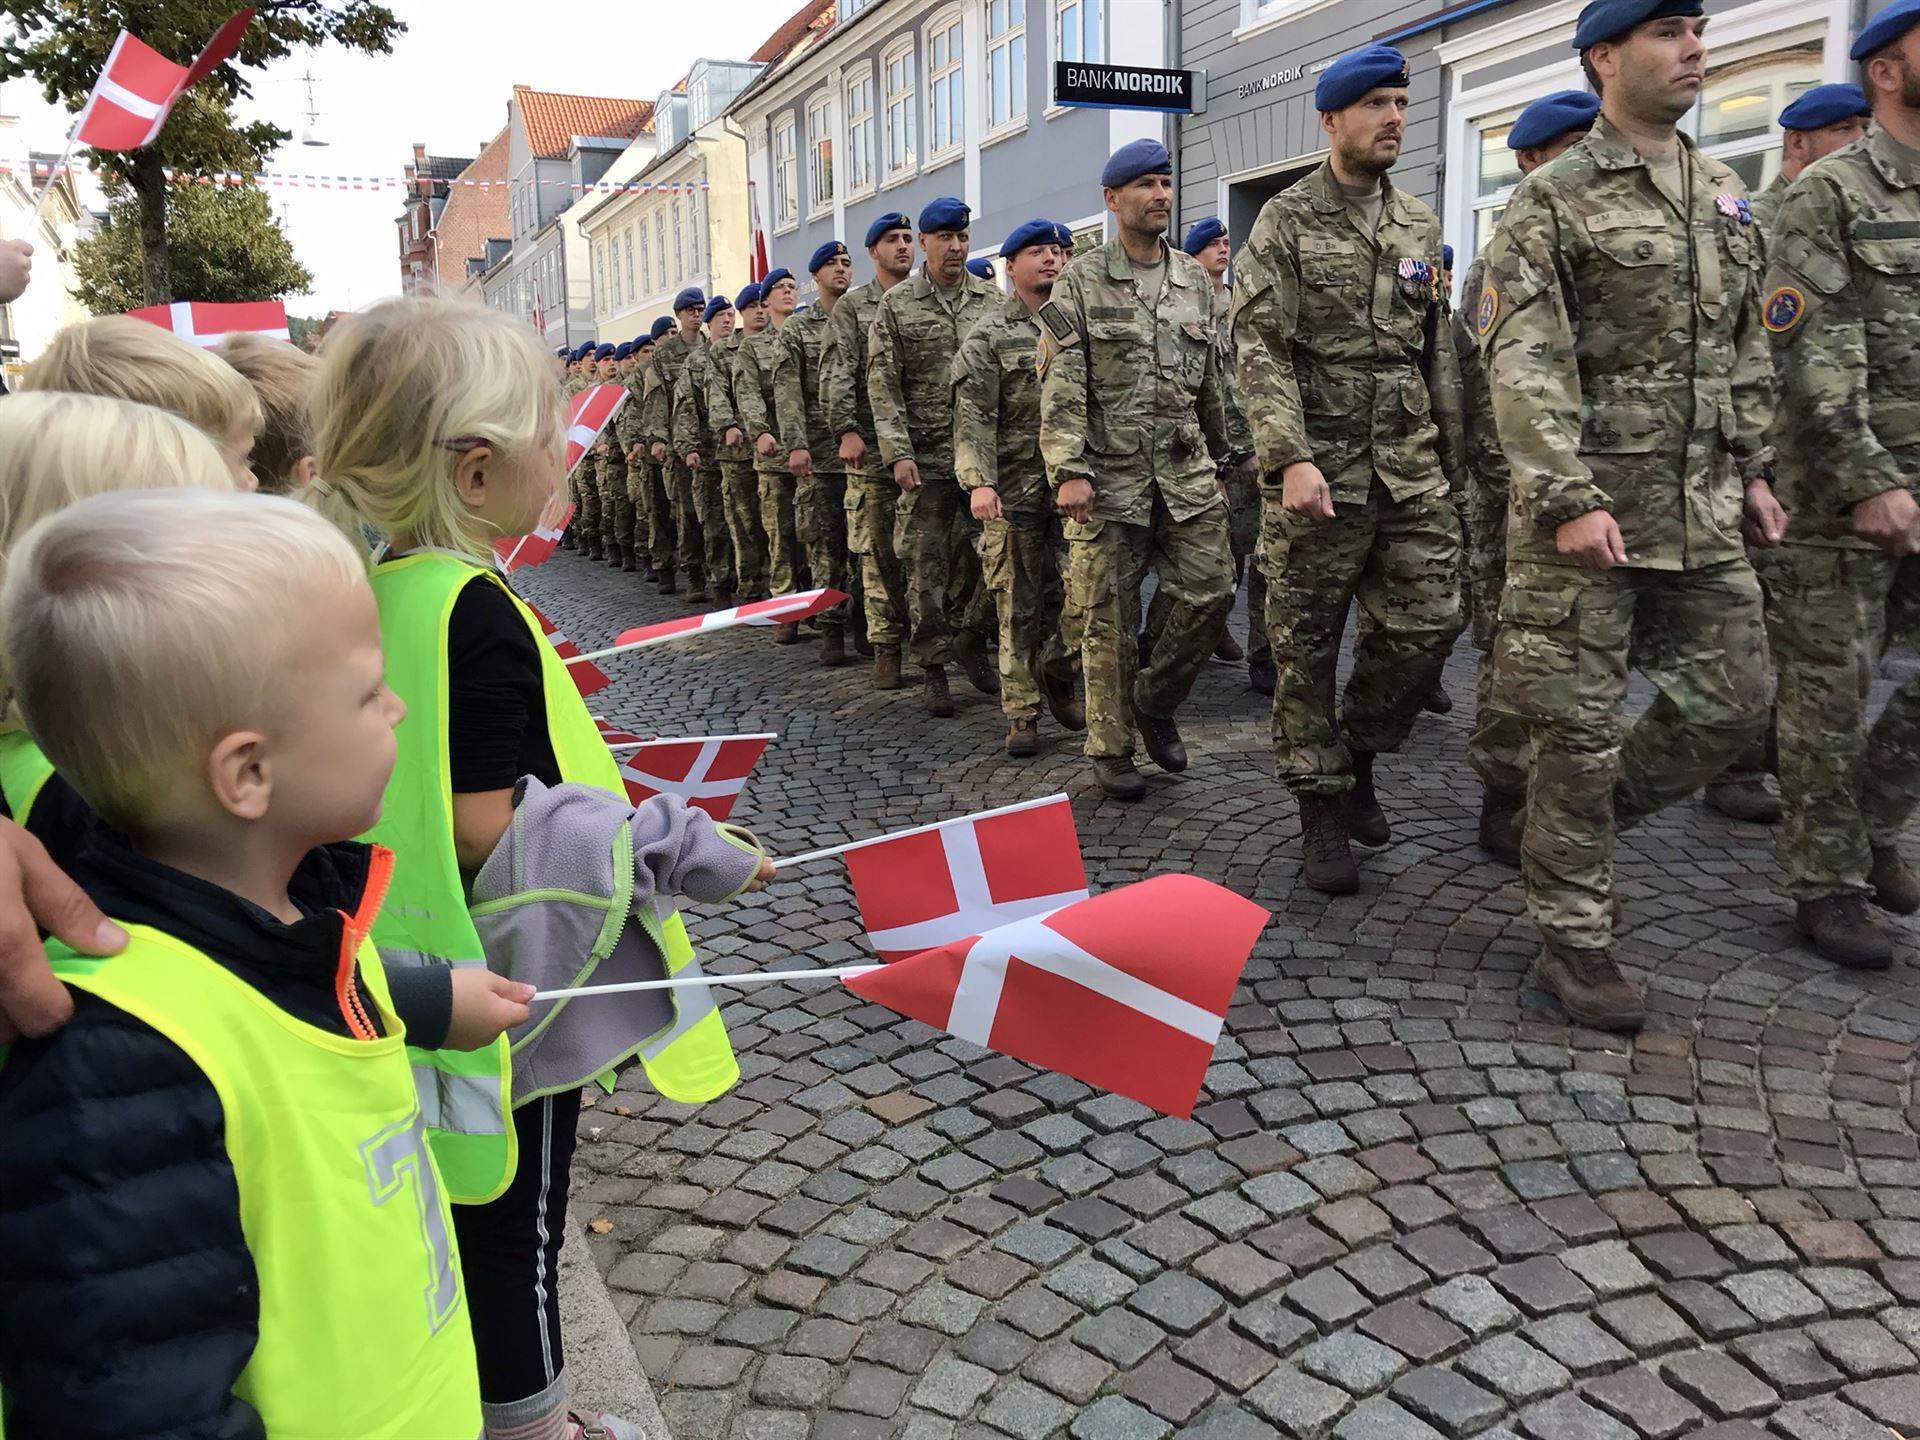 Flagdagen fejres i Haderslev Foto: Pressefoto